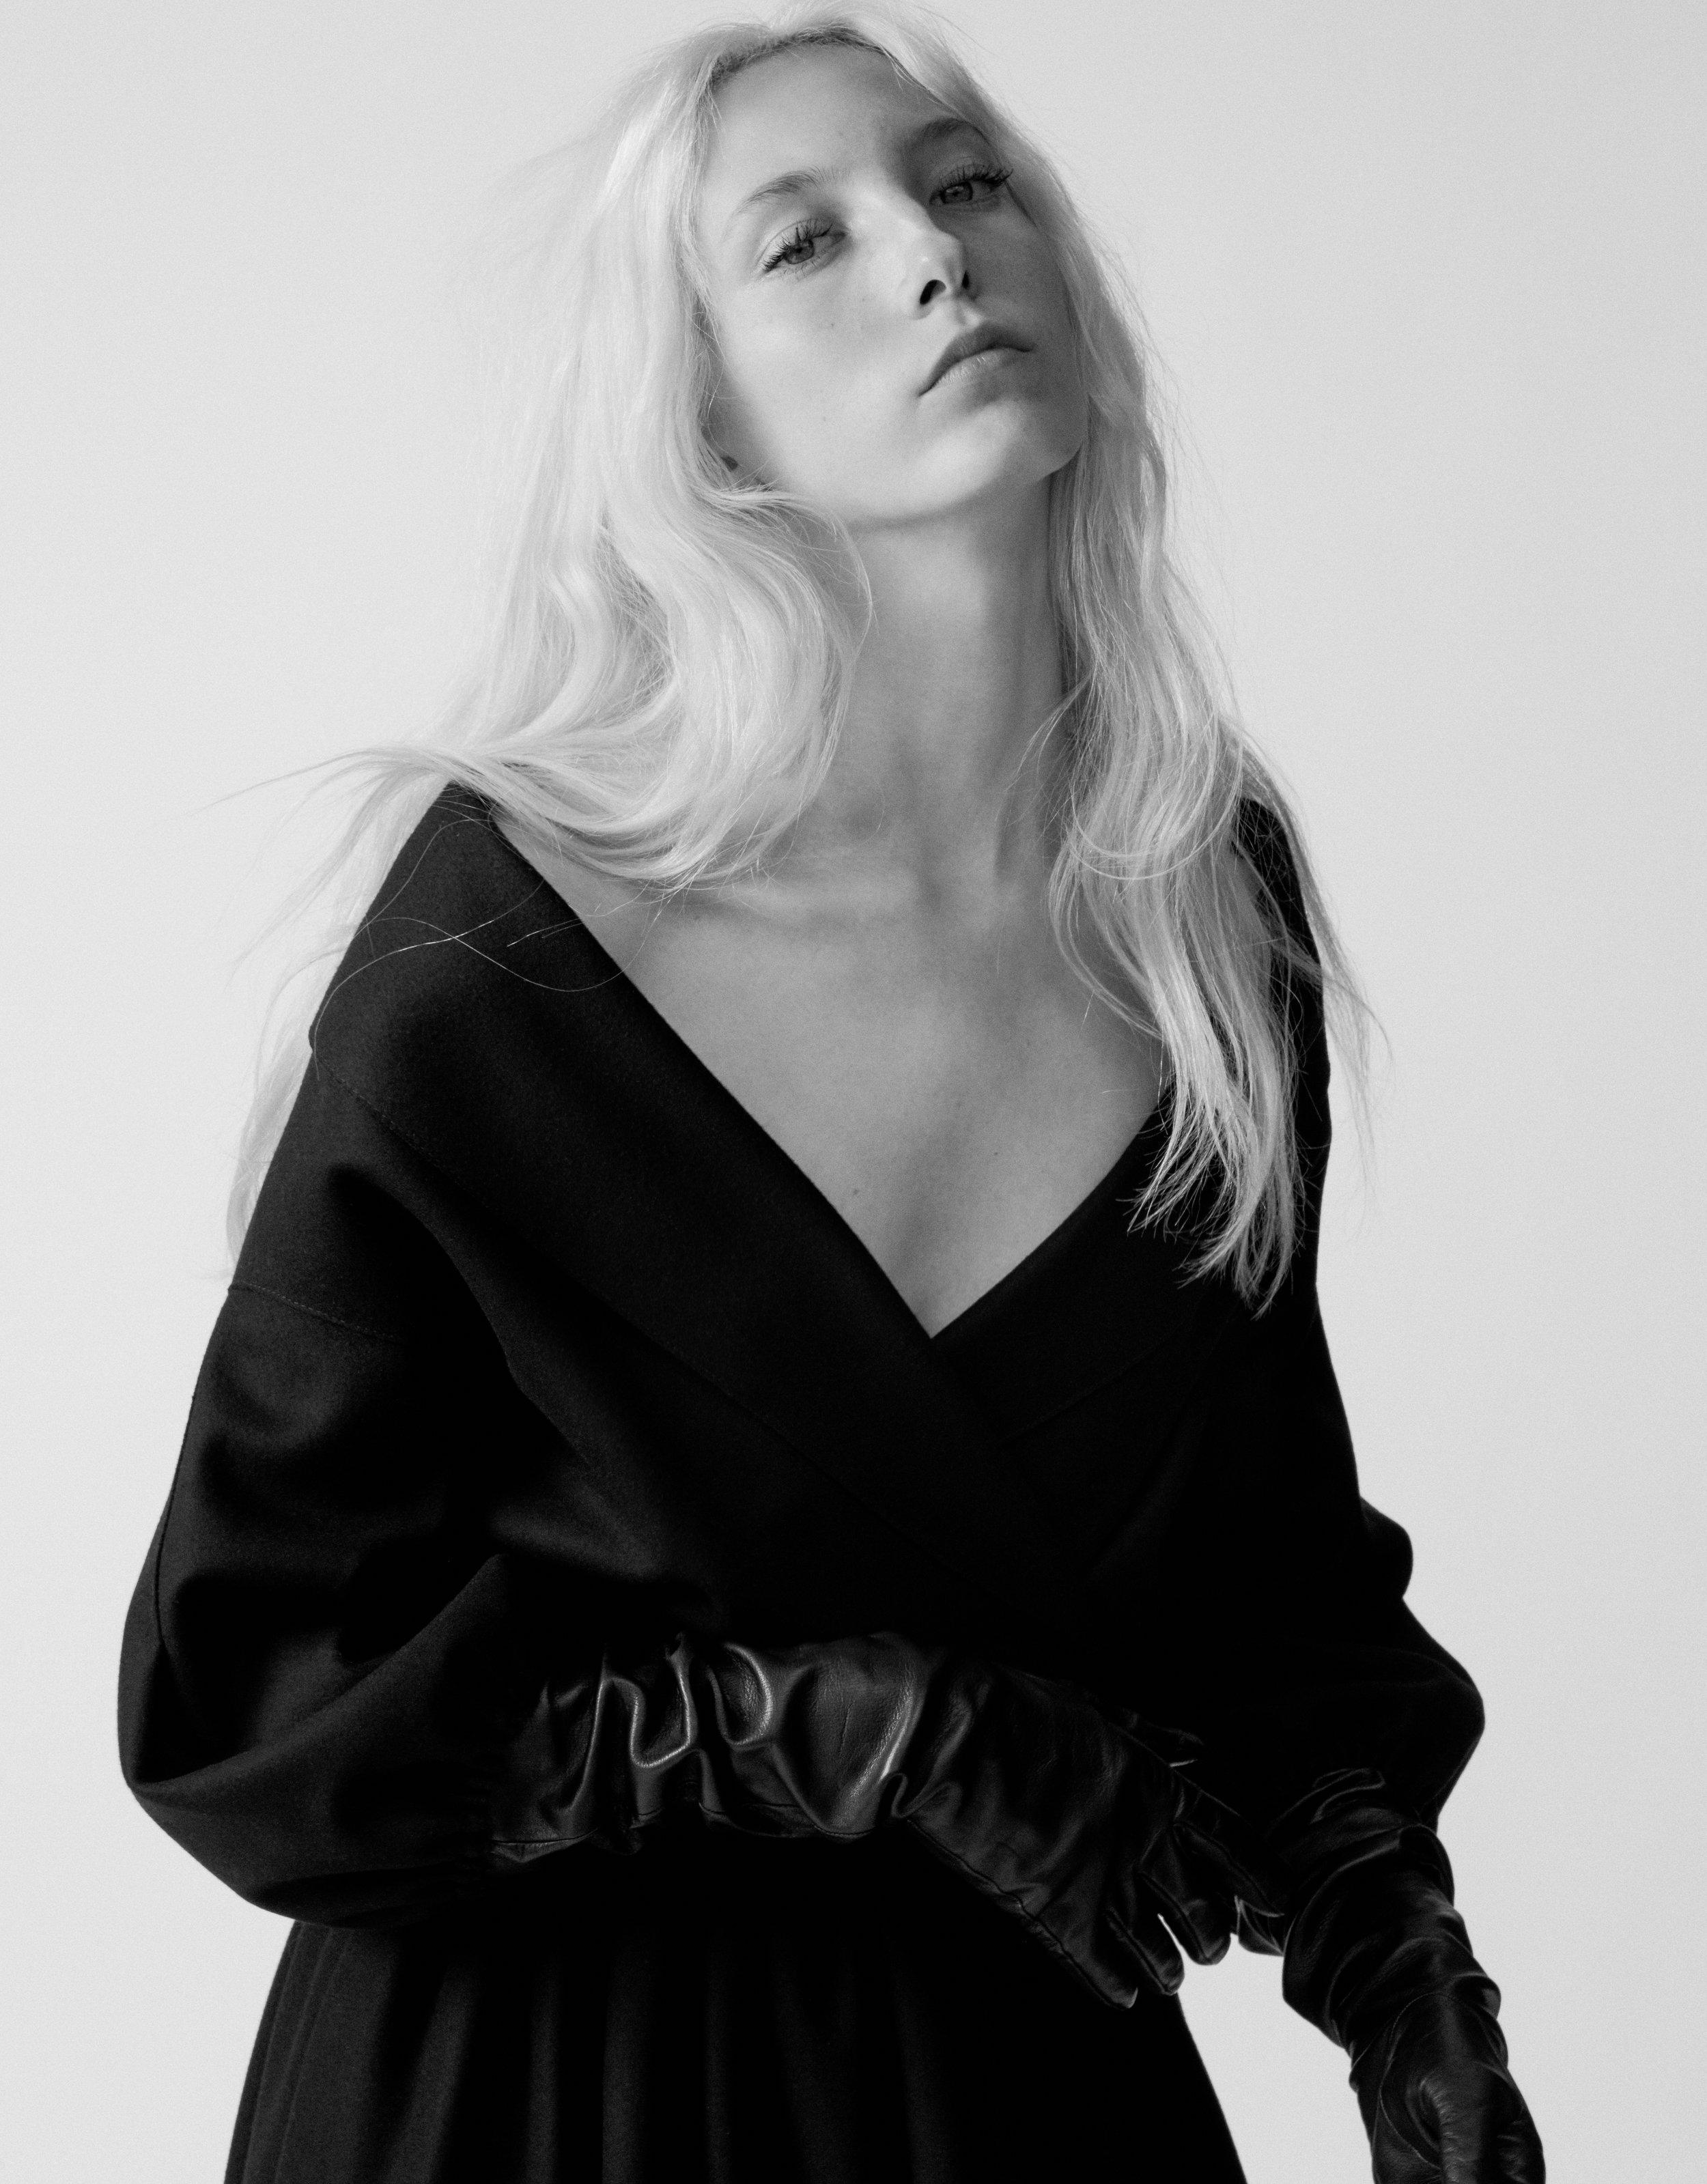 Sasha Komarova by Blair Getz Mezibov for L'Officiel USA